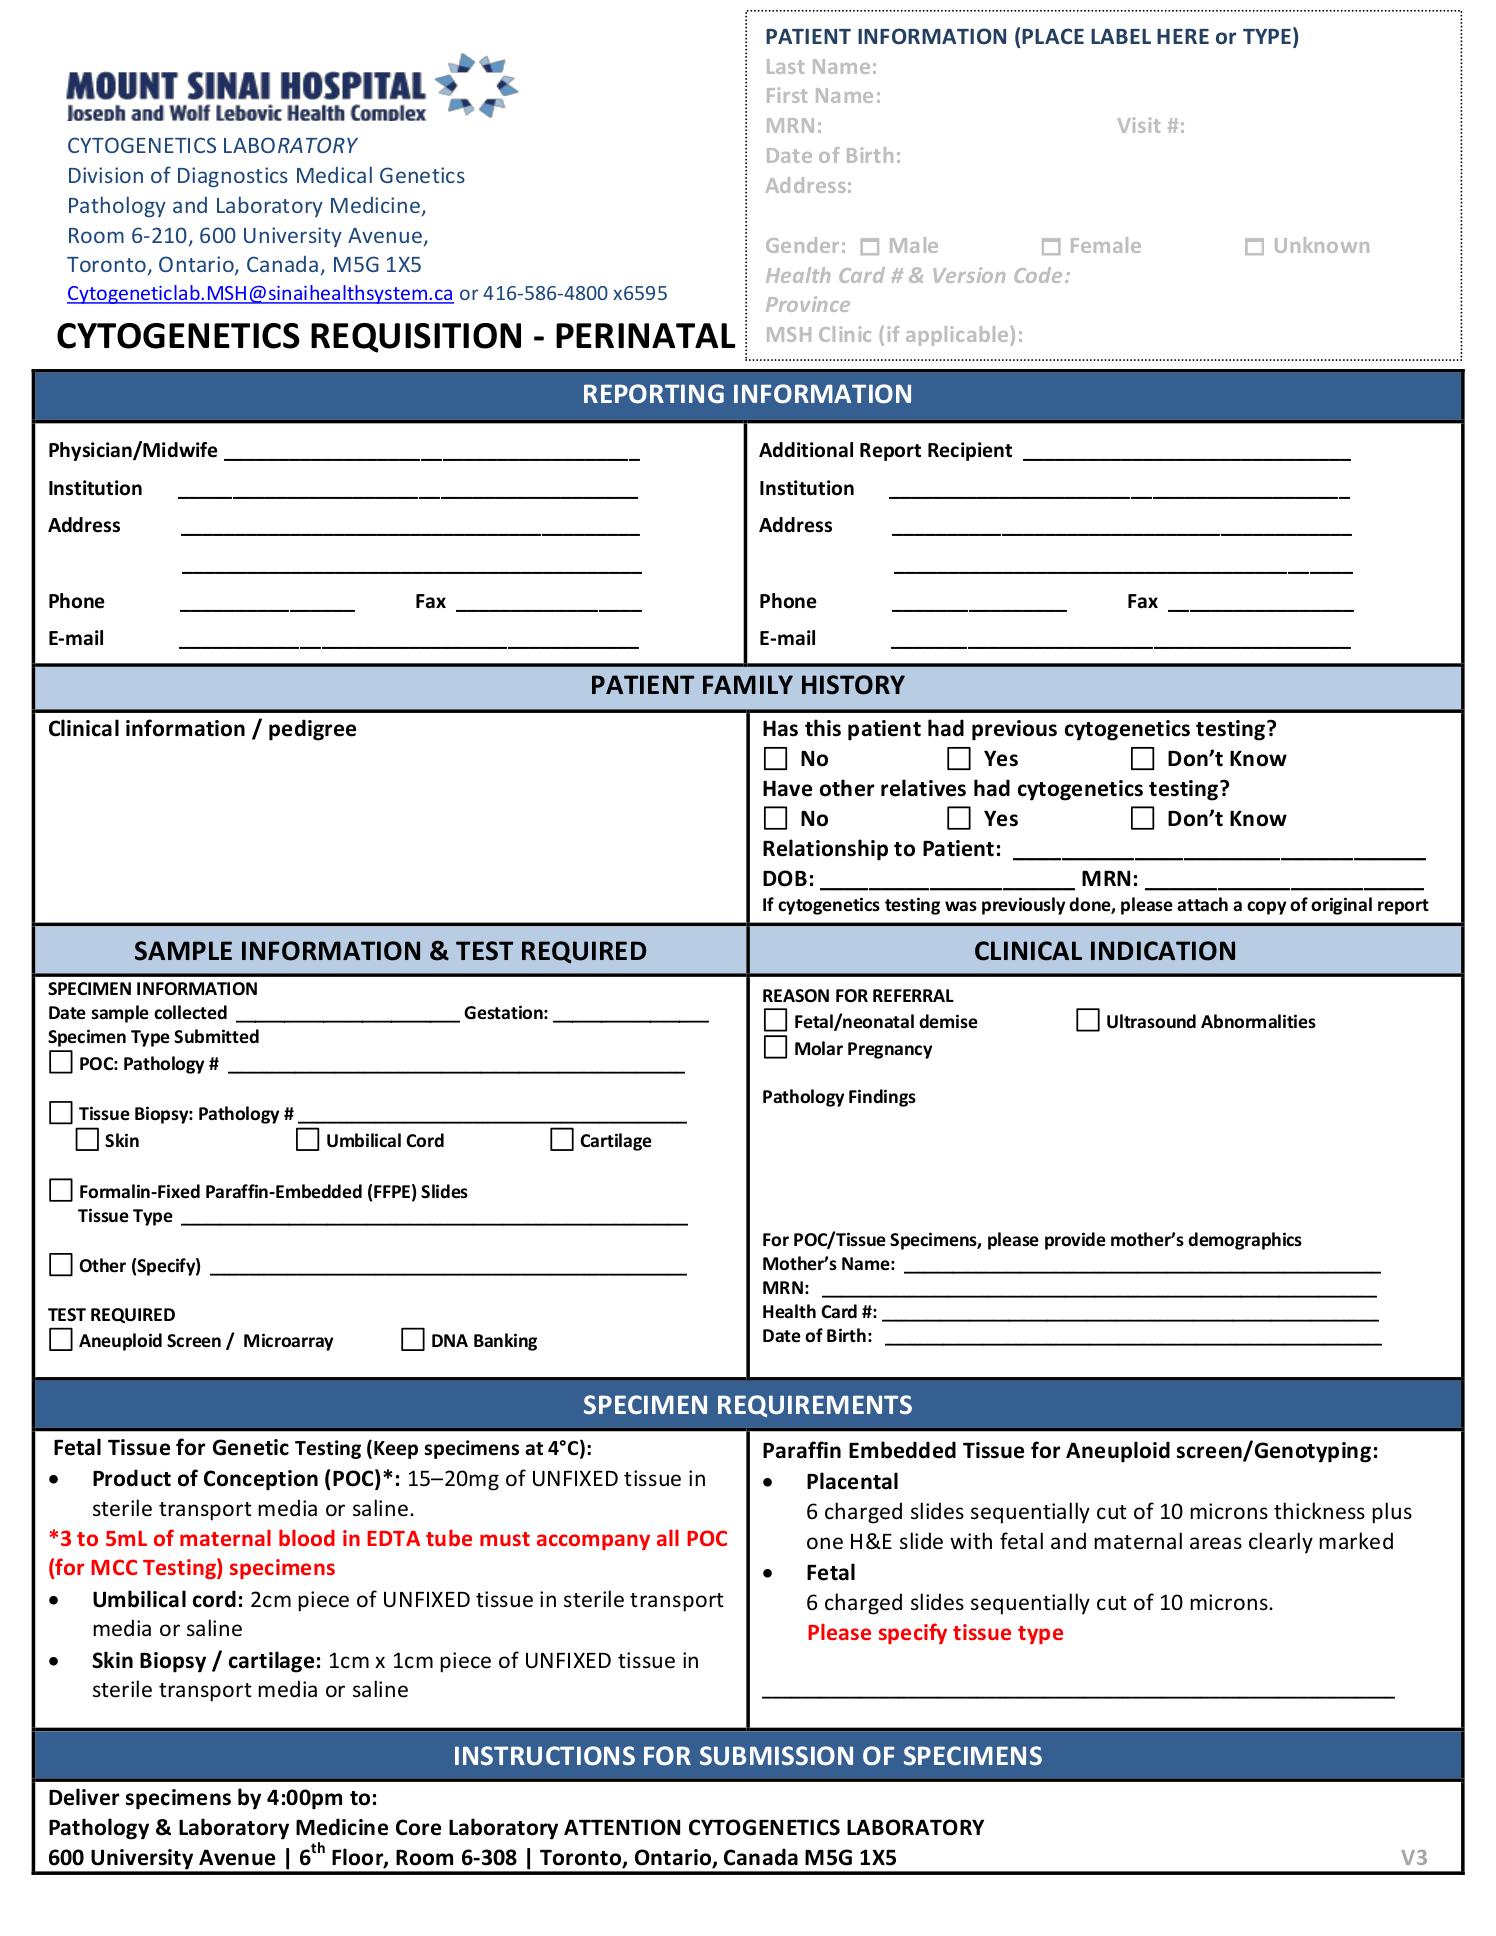 Mount Sinai Hospital Cytogenetics Requisition - Perinatal